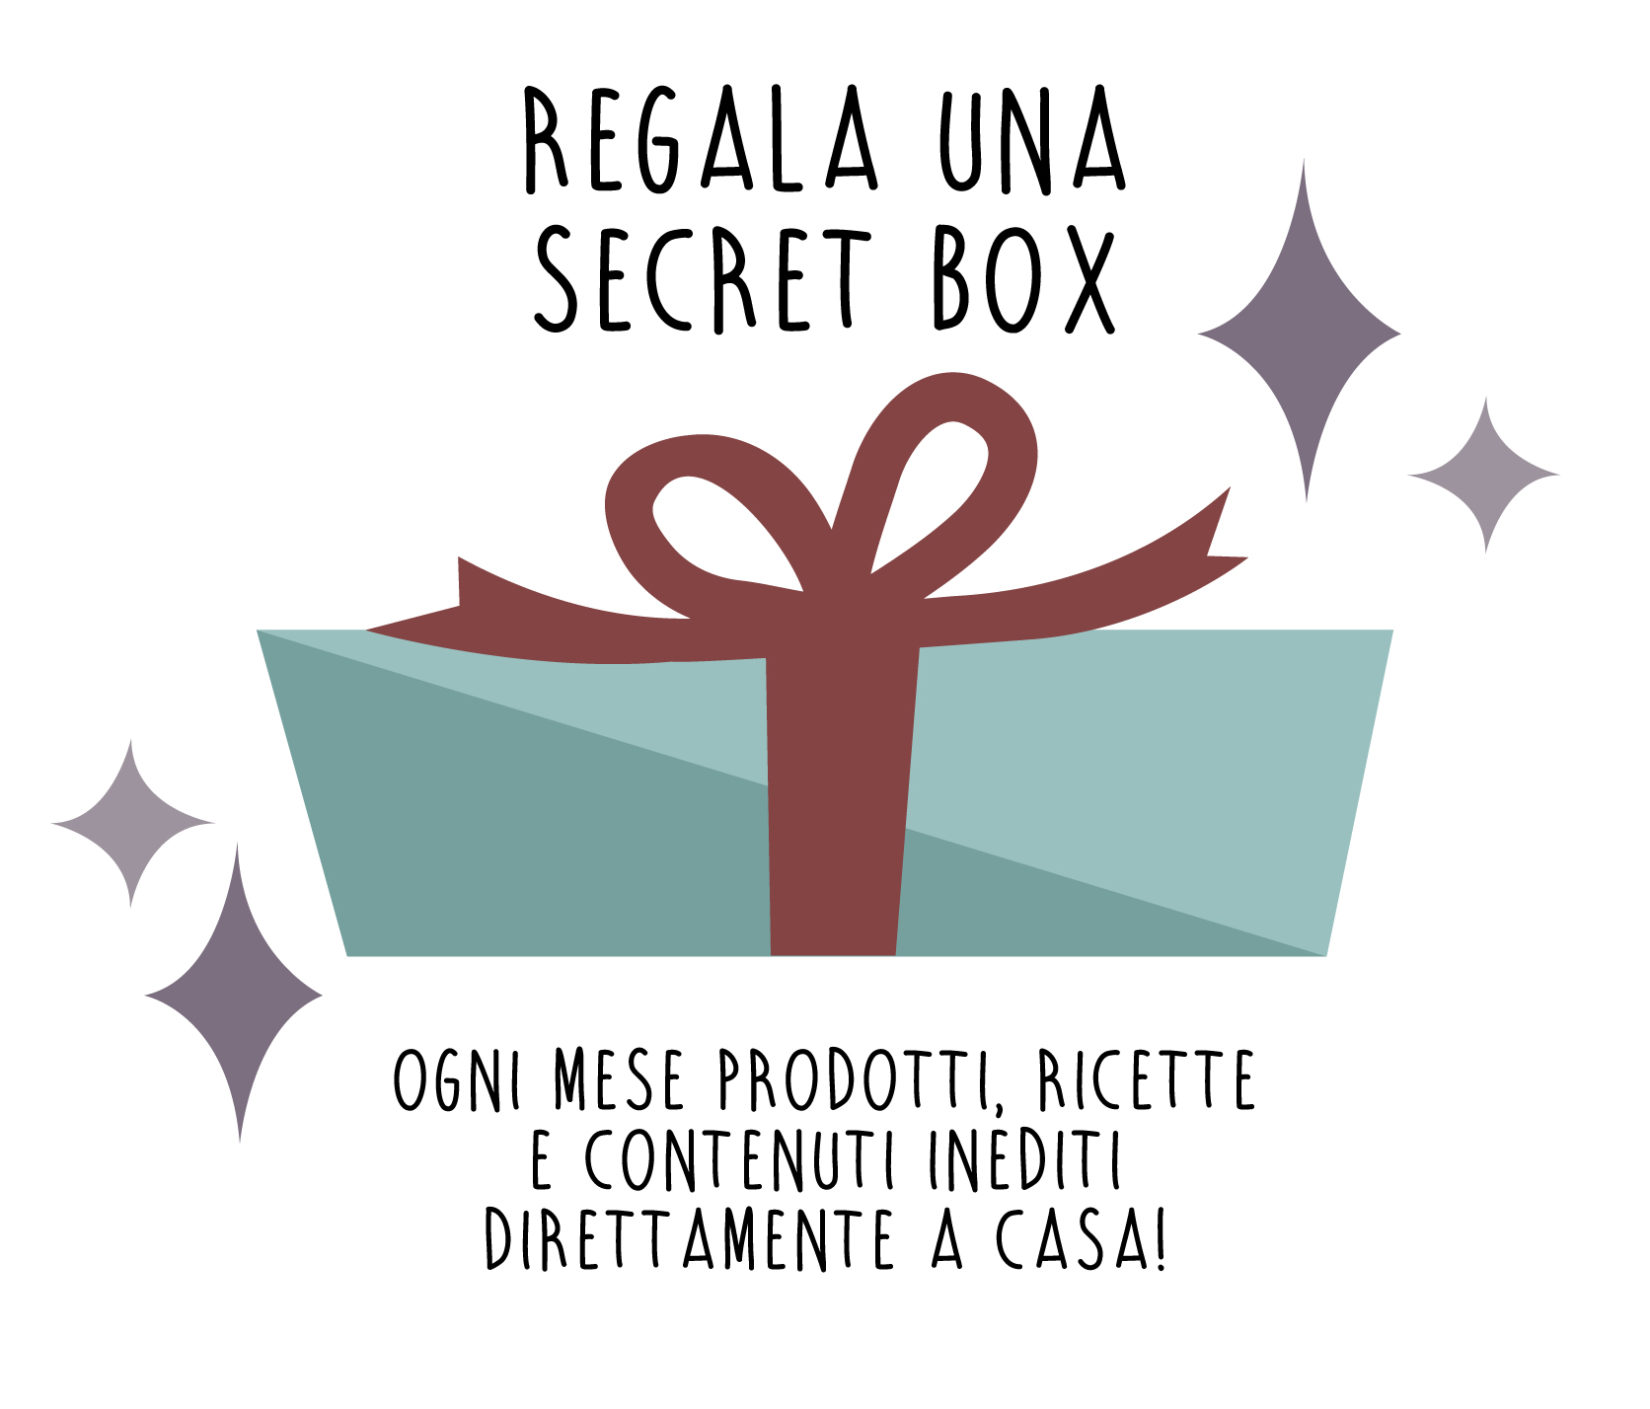 secret box negozio leggero